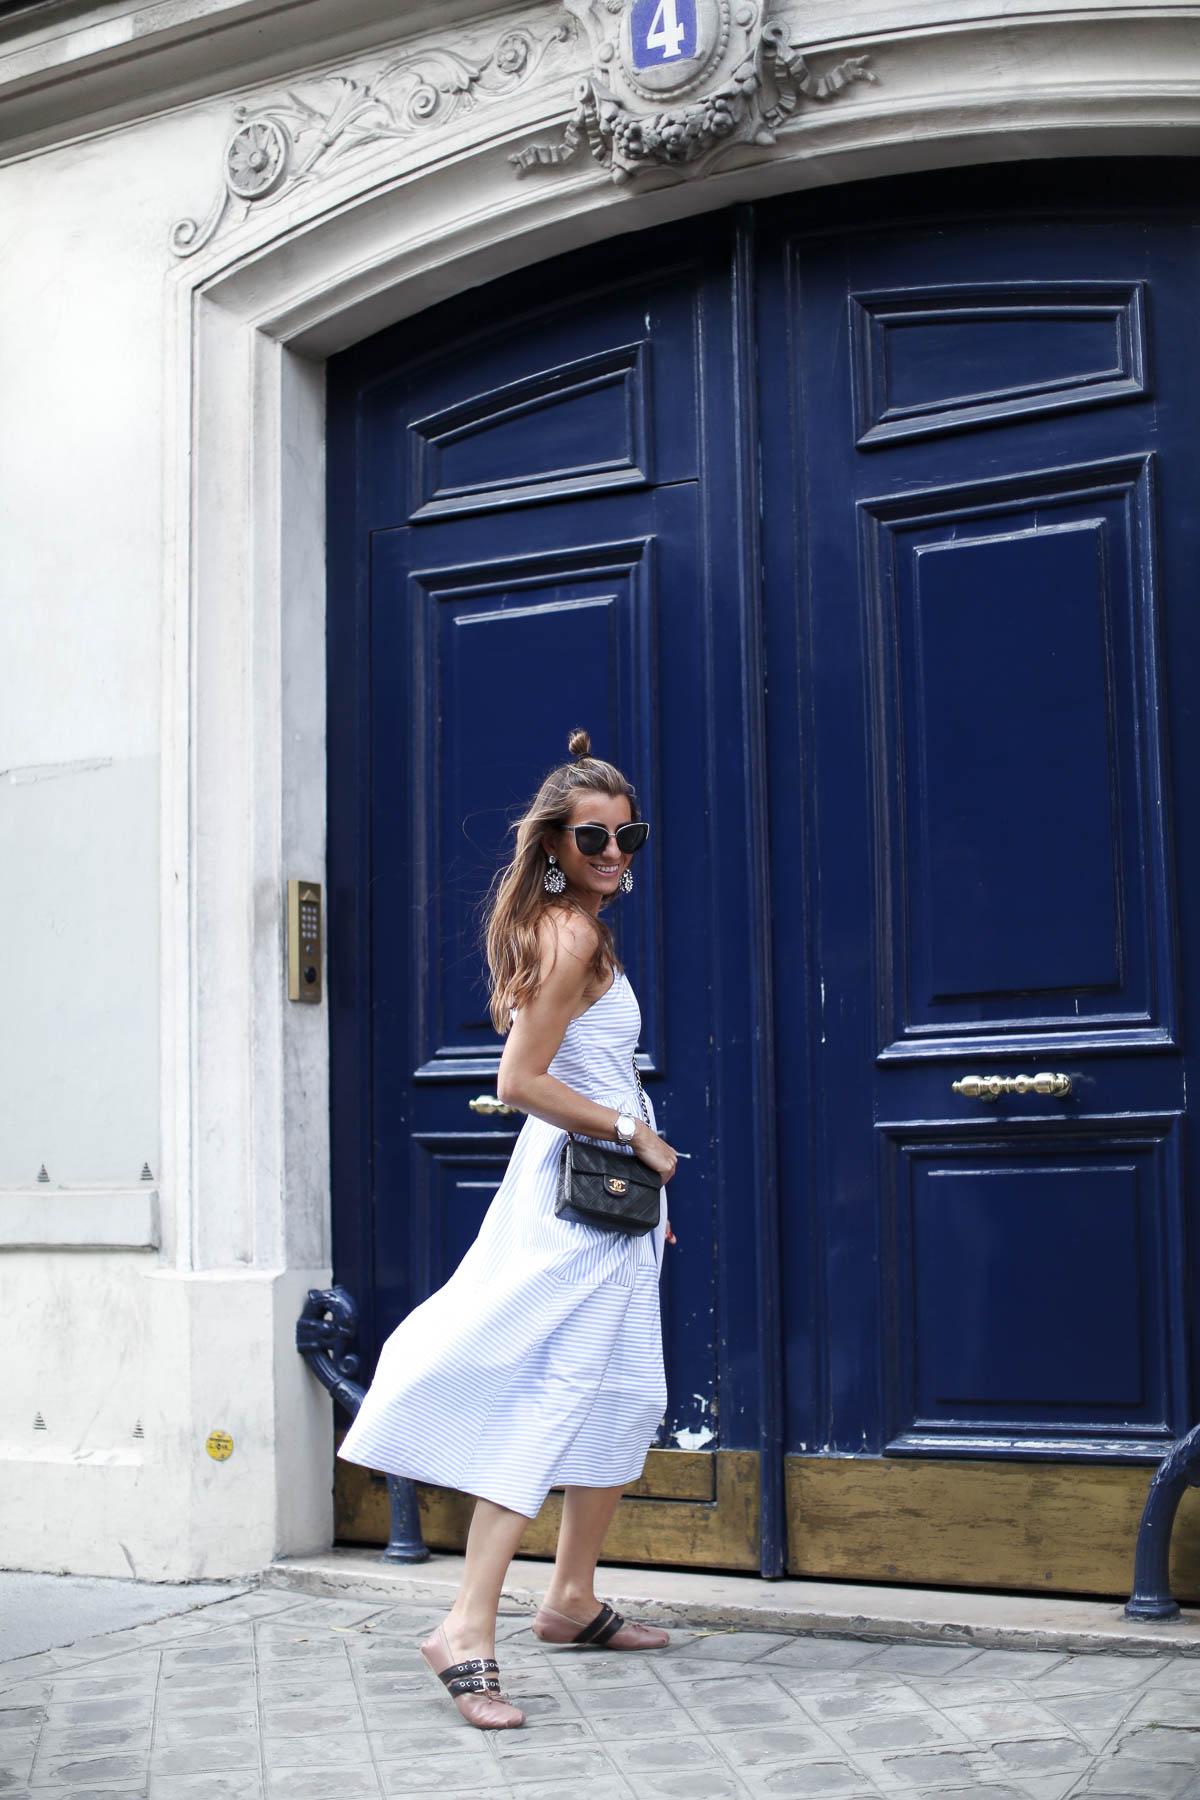 THE BLUE DOOR . PARIS-101278-bartabacmode